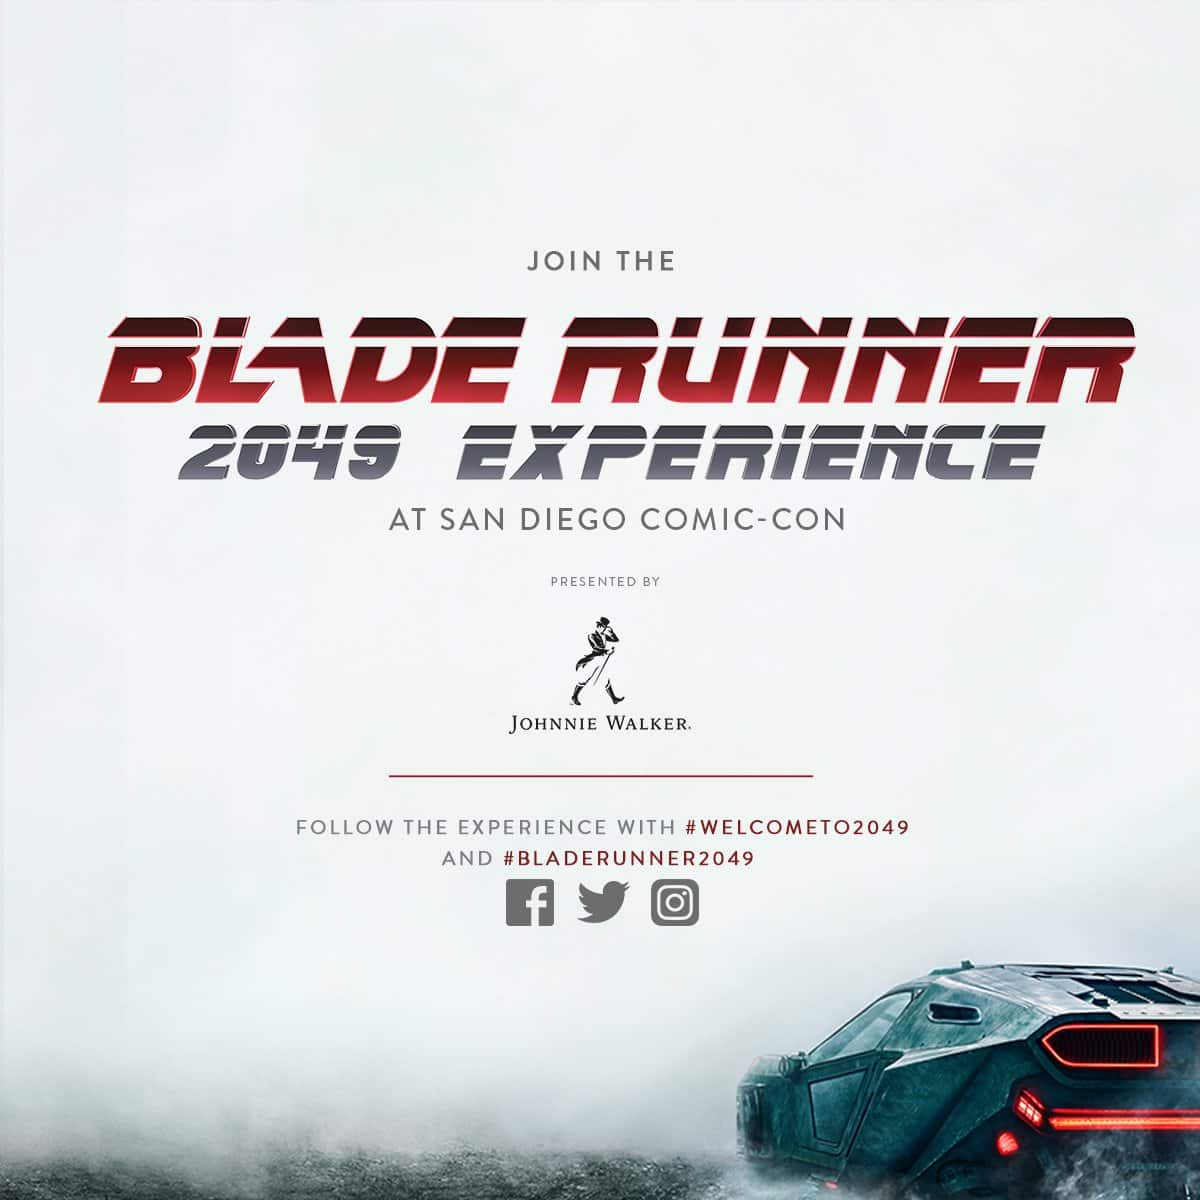 Comic Con Blade Runner 2049 Experience